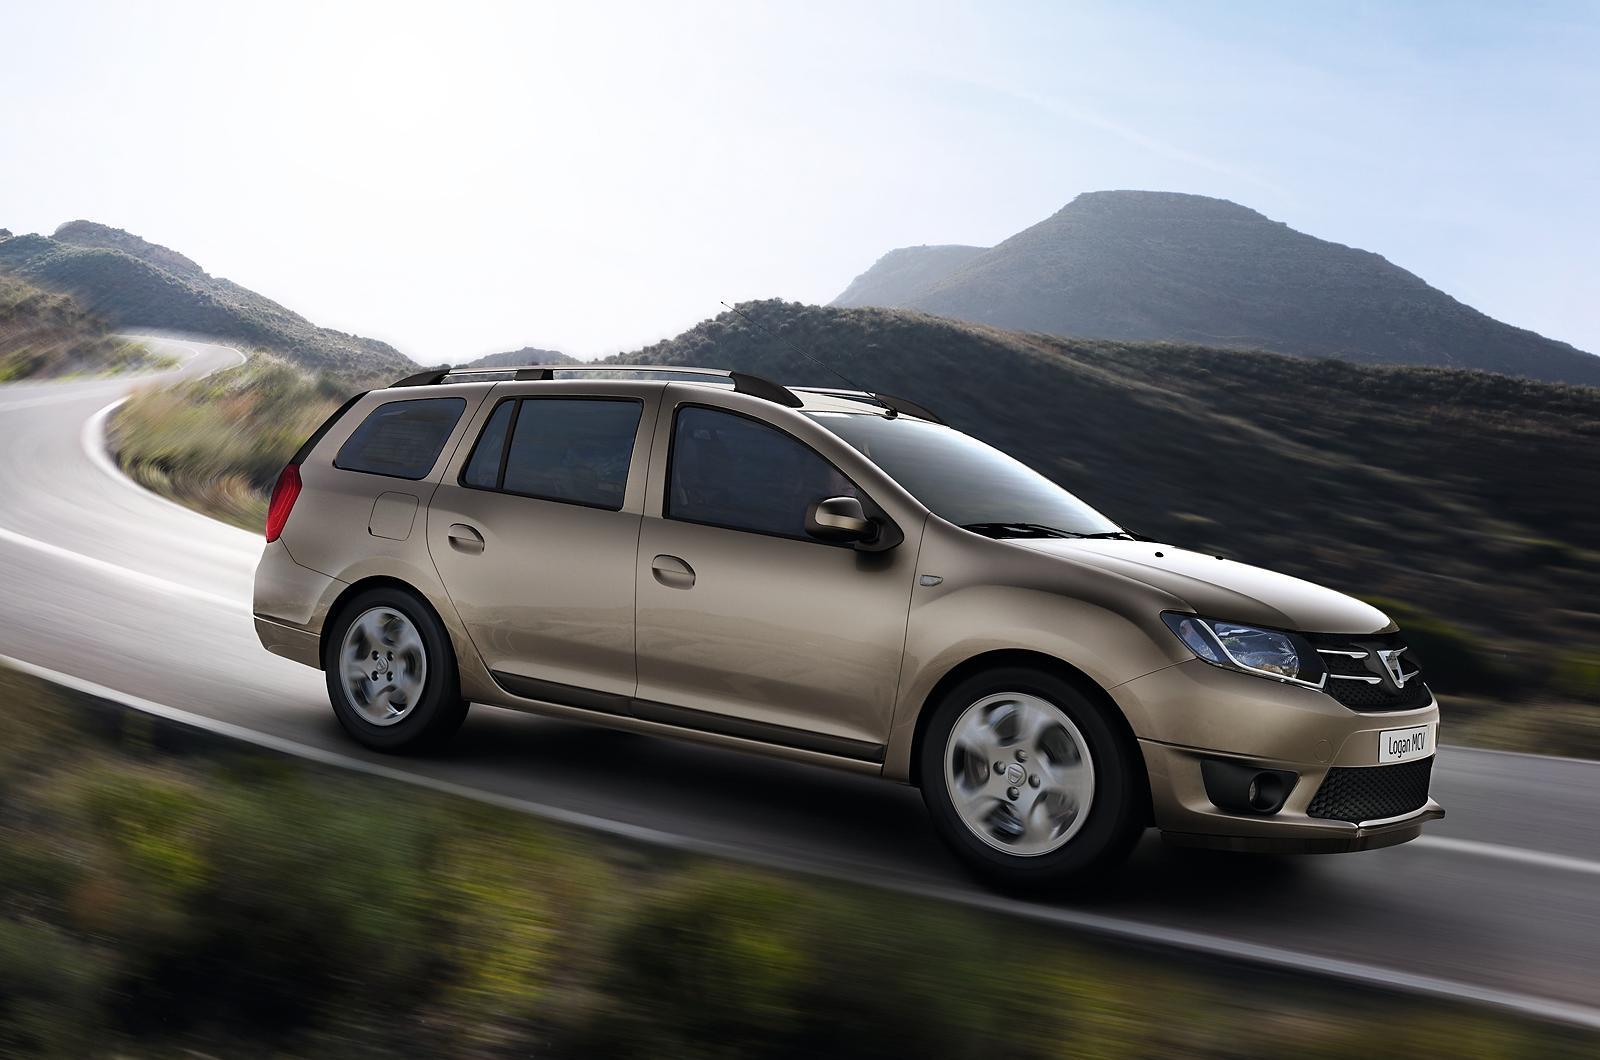 2014 Dacia Logan MCV İngiltere'de 19.175 TL'den Başlayan